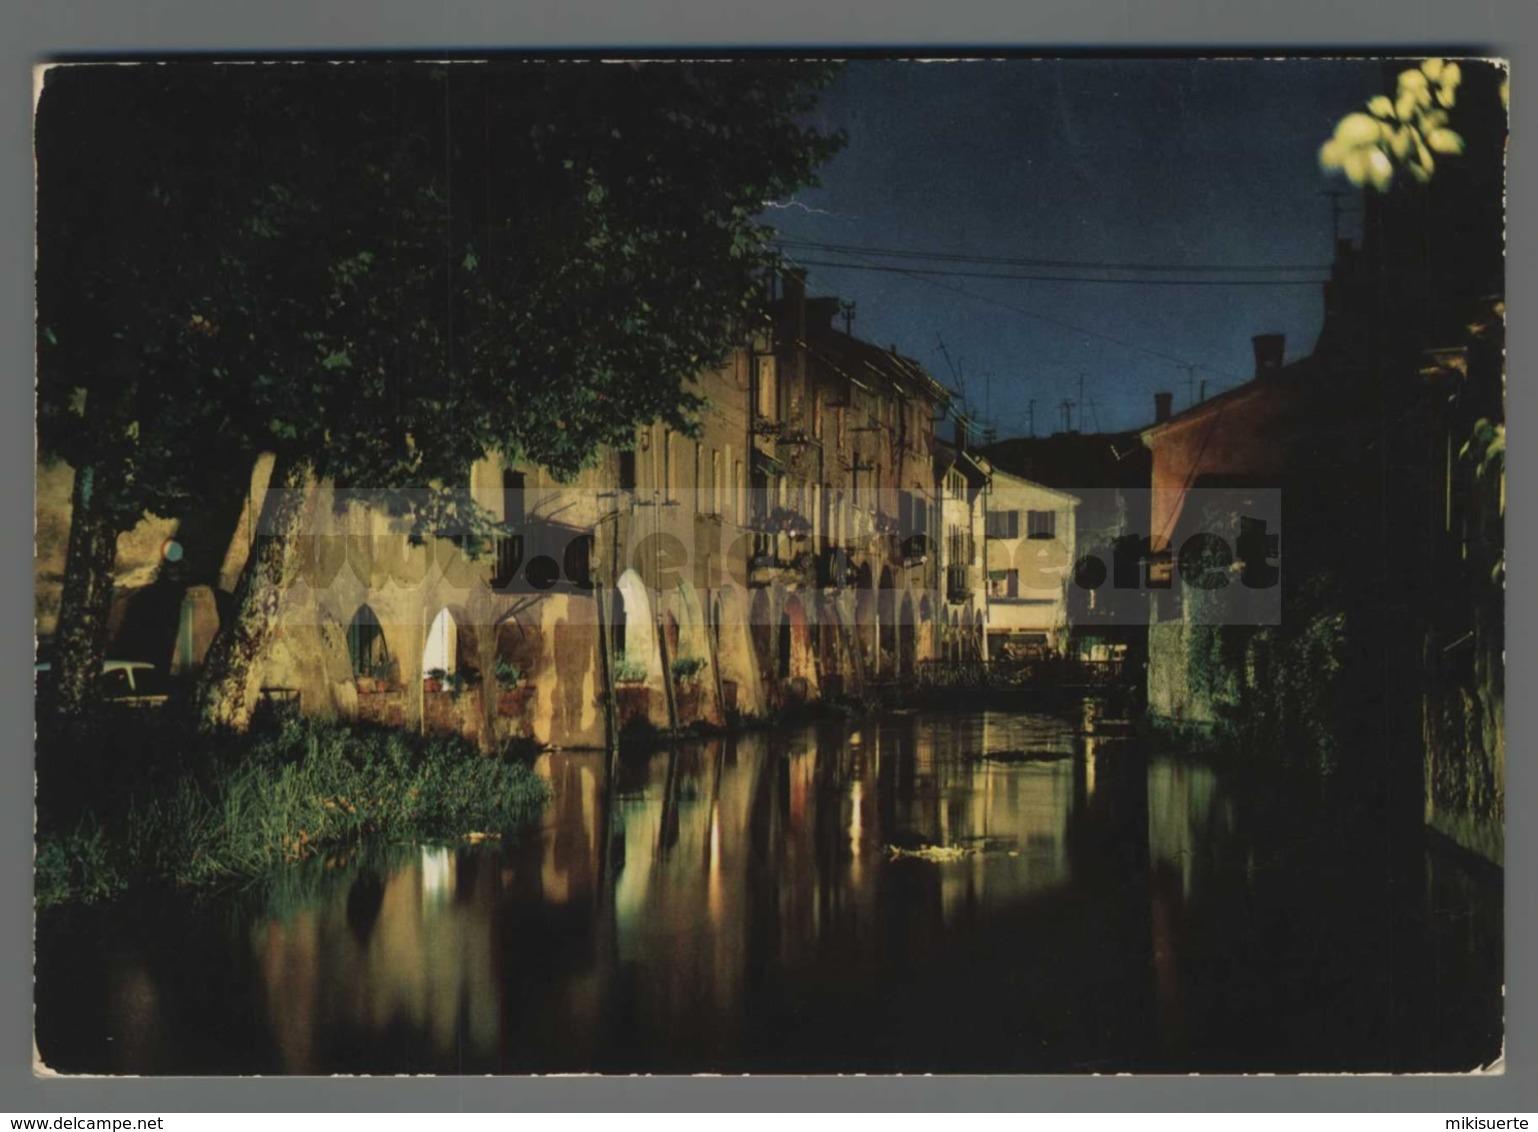 V7694 TREVISO SOTTOPORTICO BURANELLI NOTTURNO VG SB (m) - Treviso